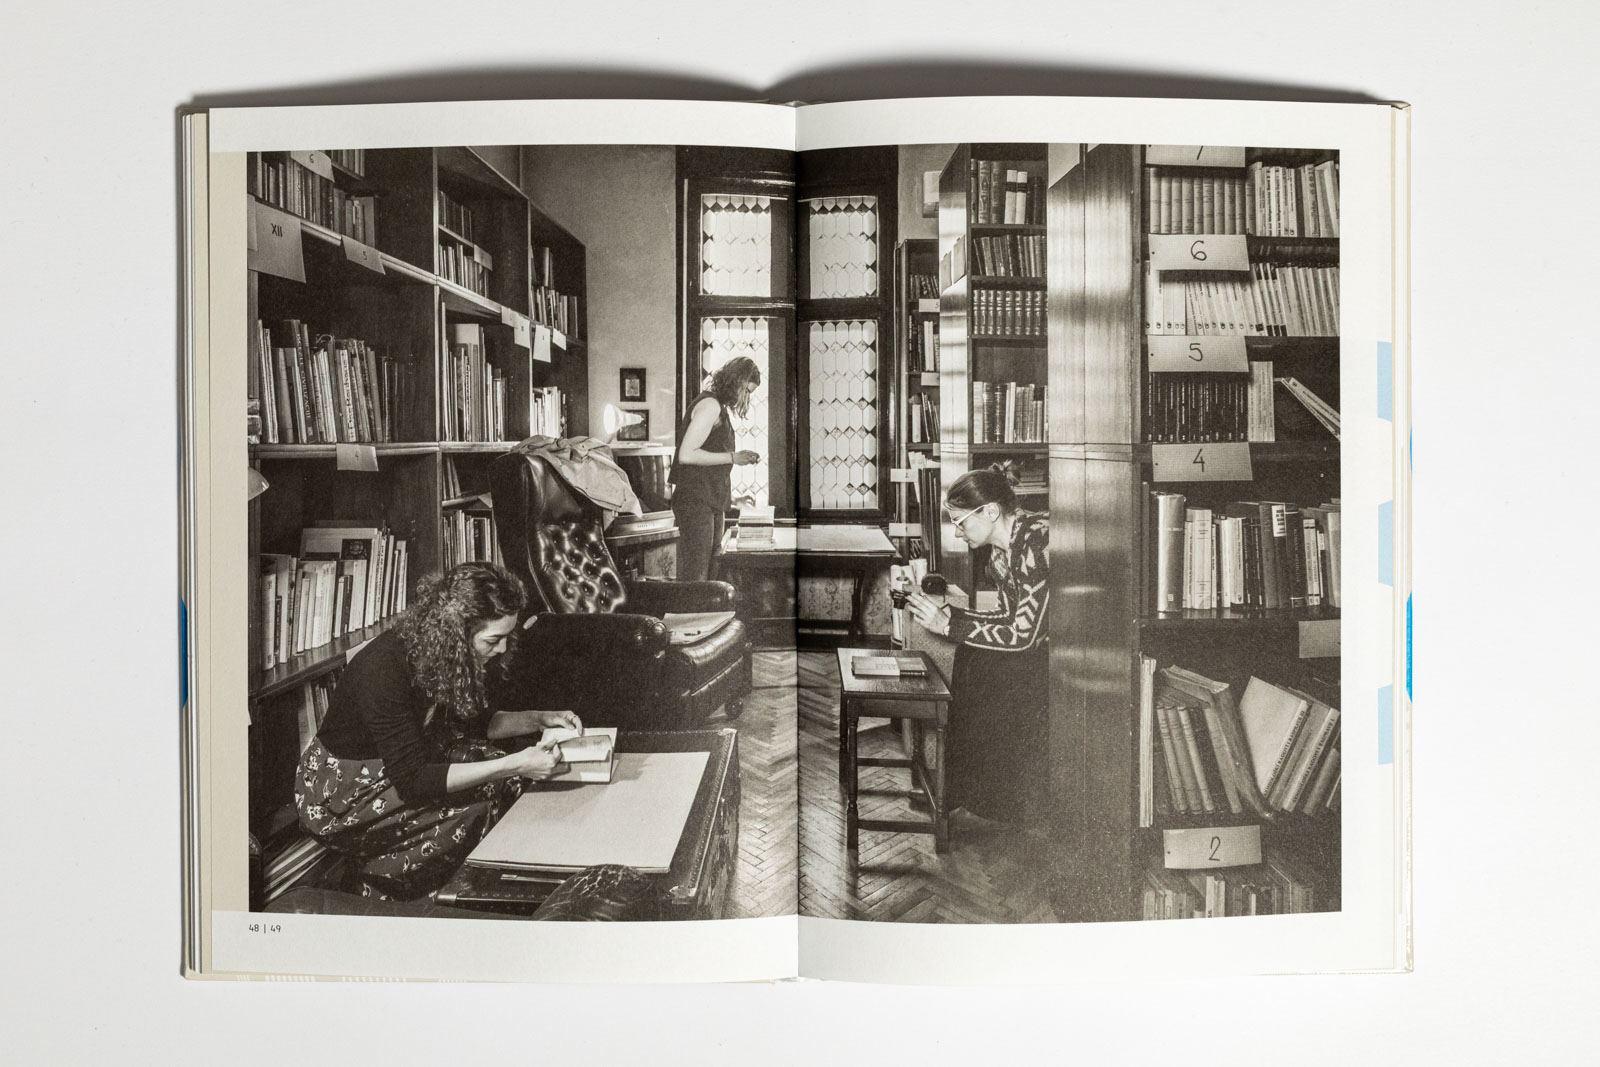 Bogdan Bogdanovic Biblioteka Beograd